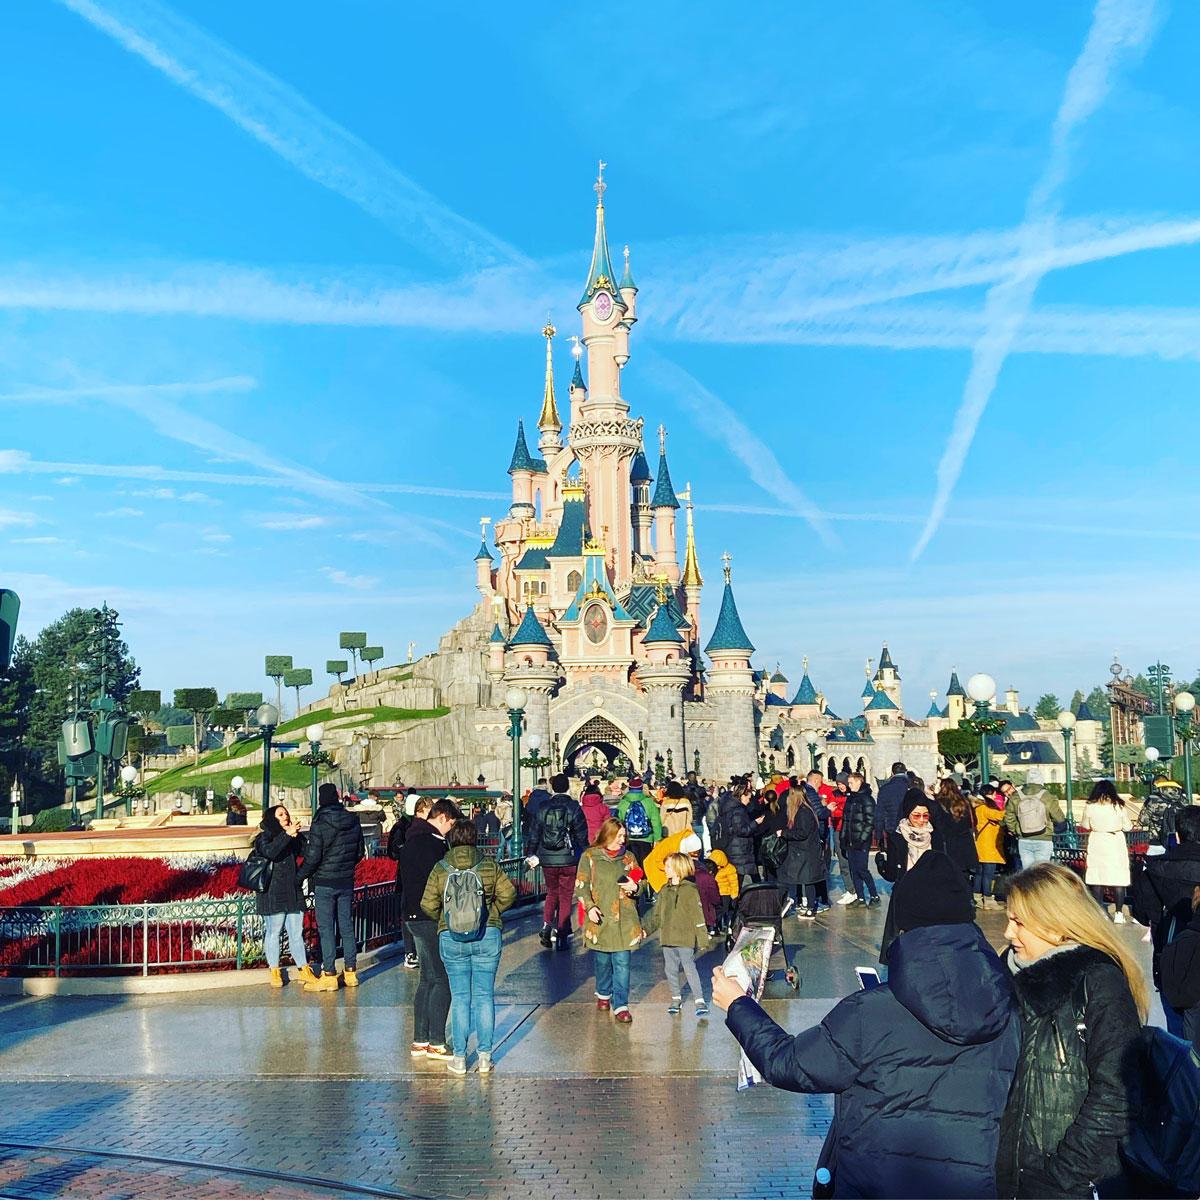 Obligatory Disney Castle Pic